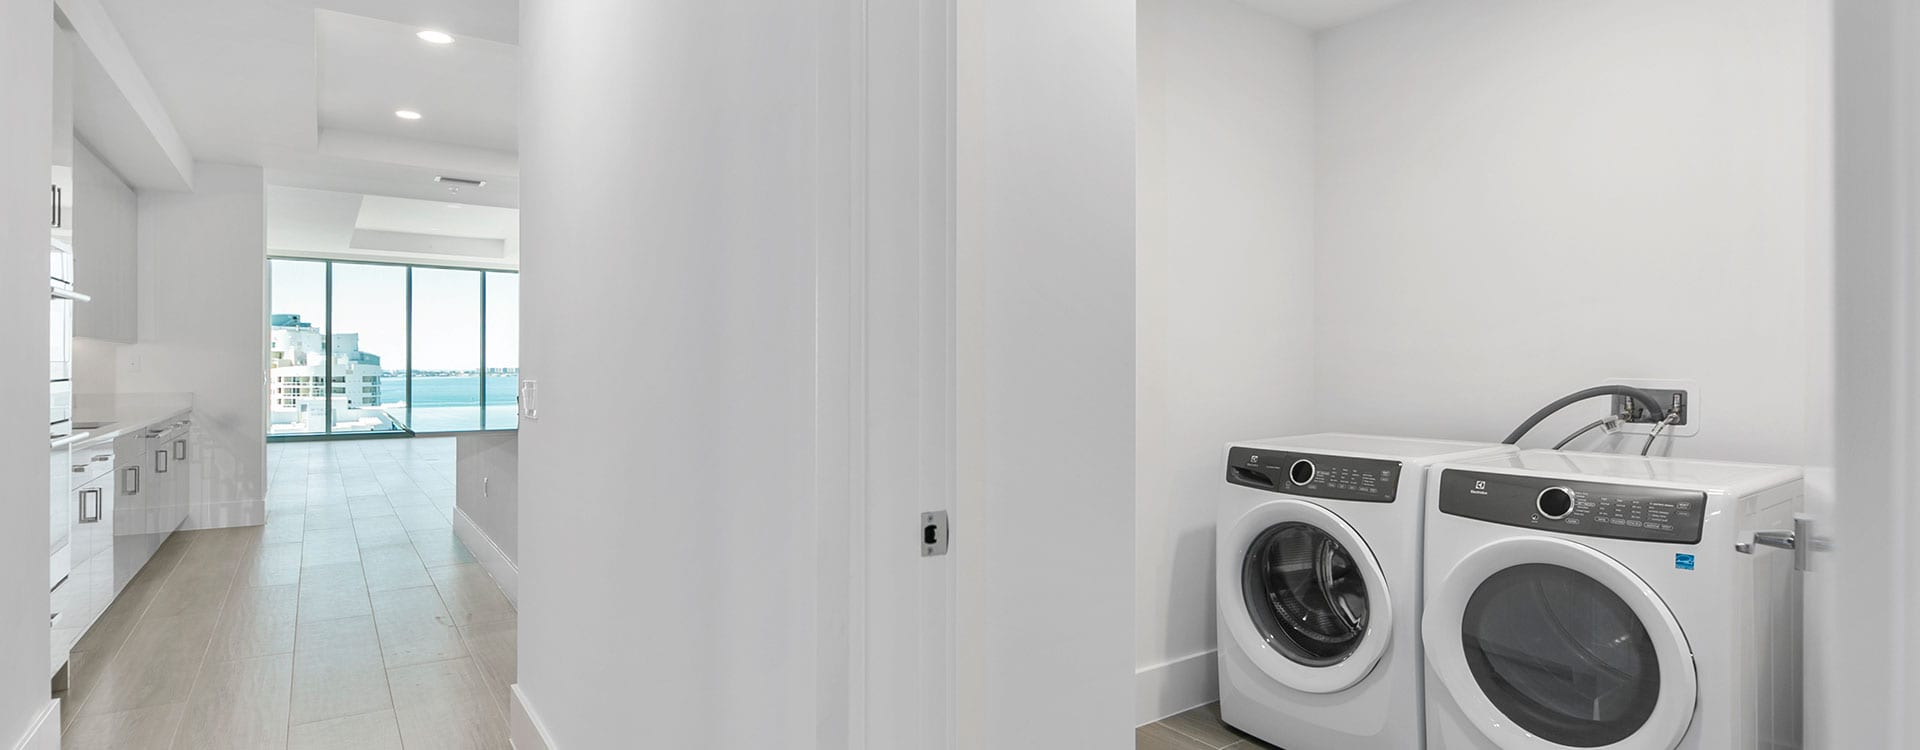 blvd sarasota residence 1503 laundry